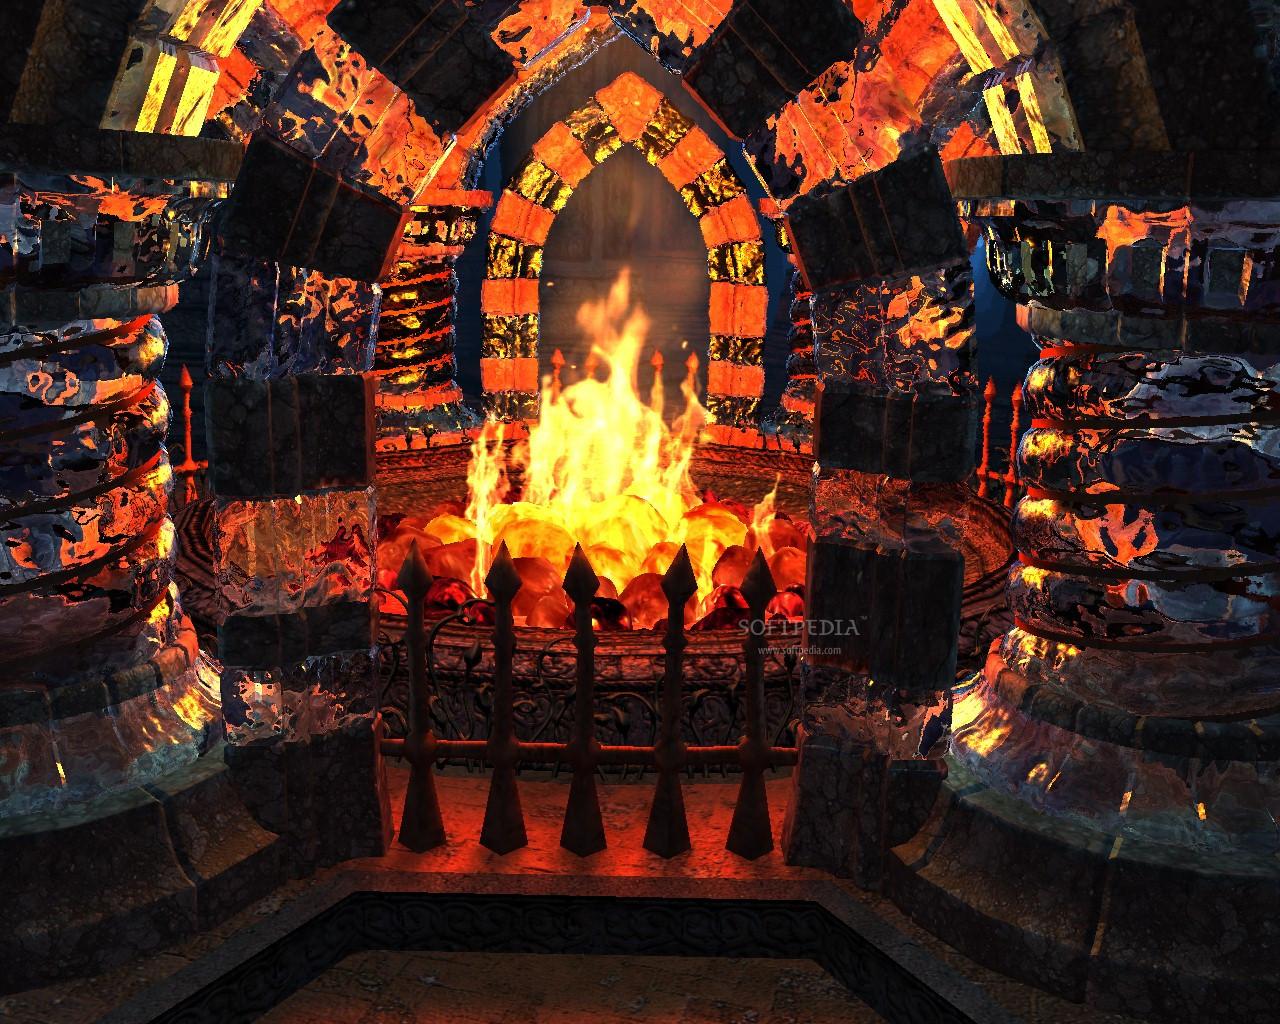 Christmas Fireplace Screensaver  Download Crystal Fireplace 3D Screensaver 1 1 Build 11